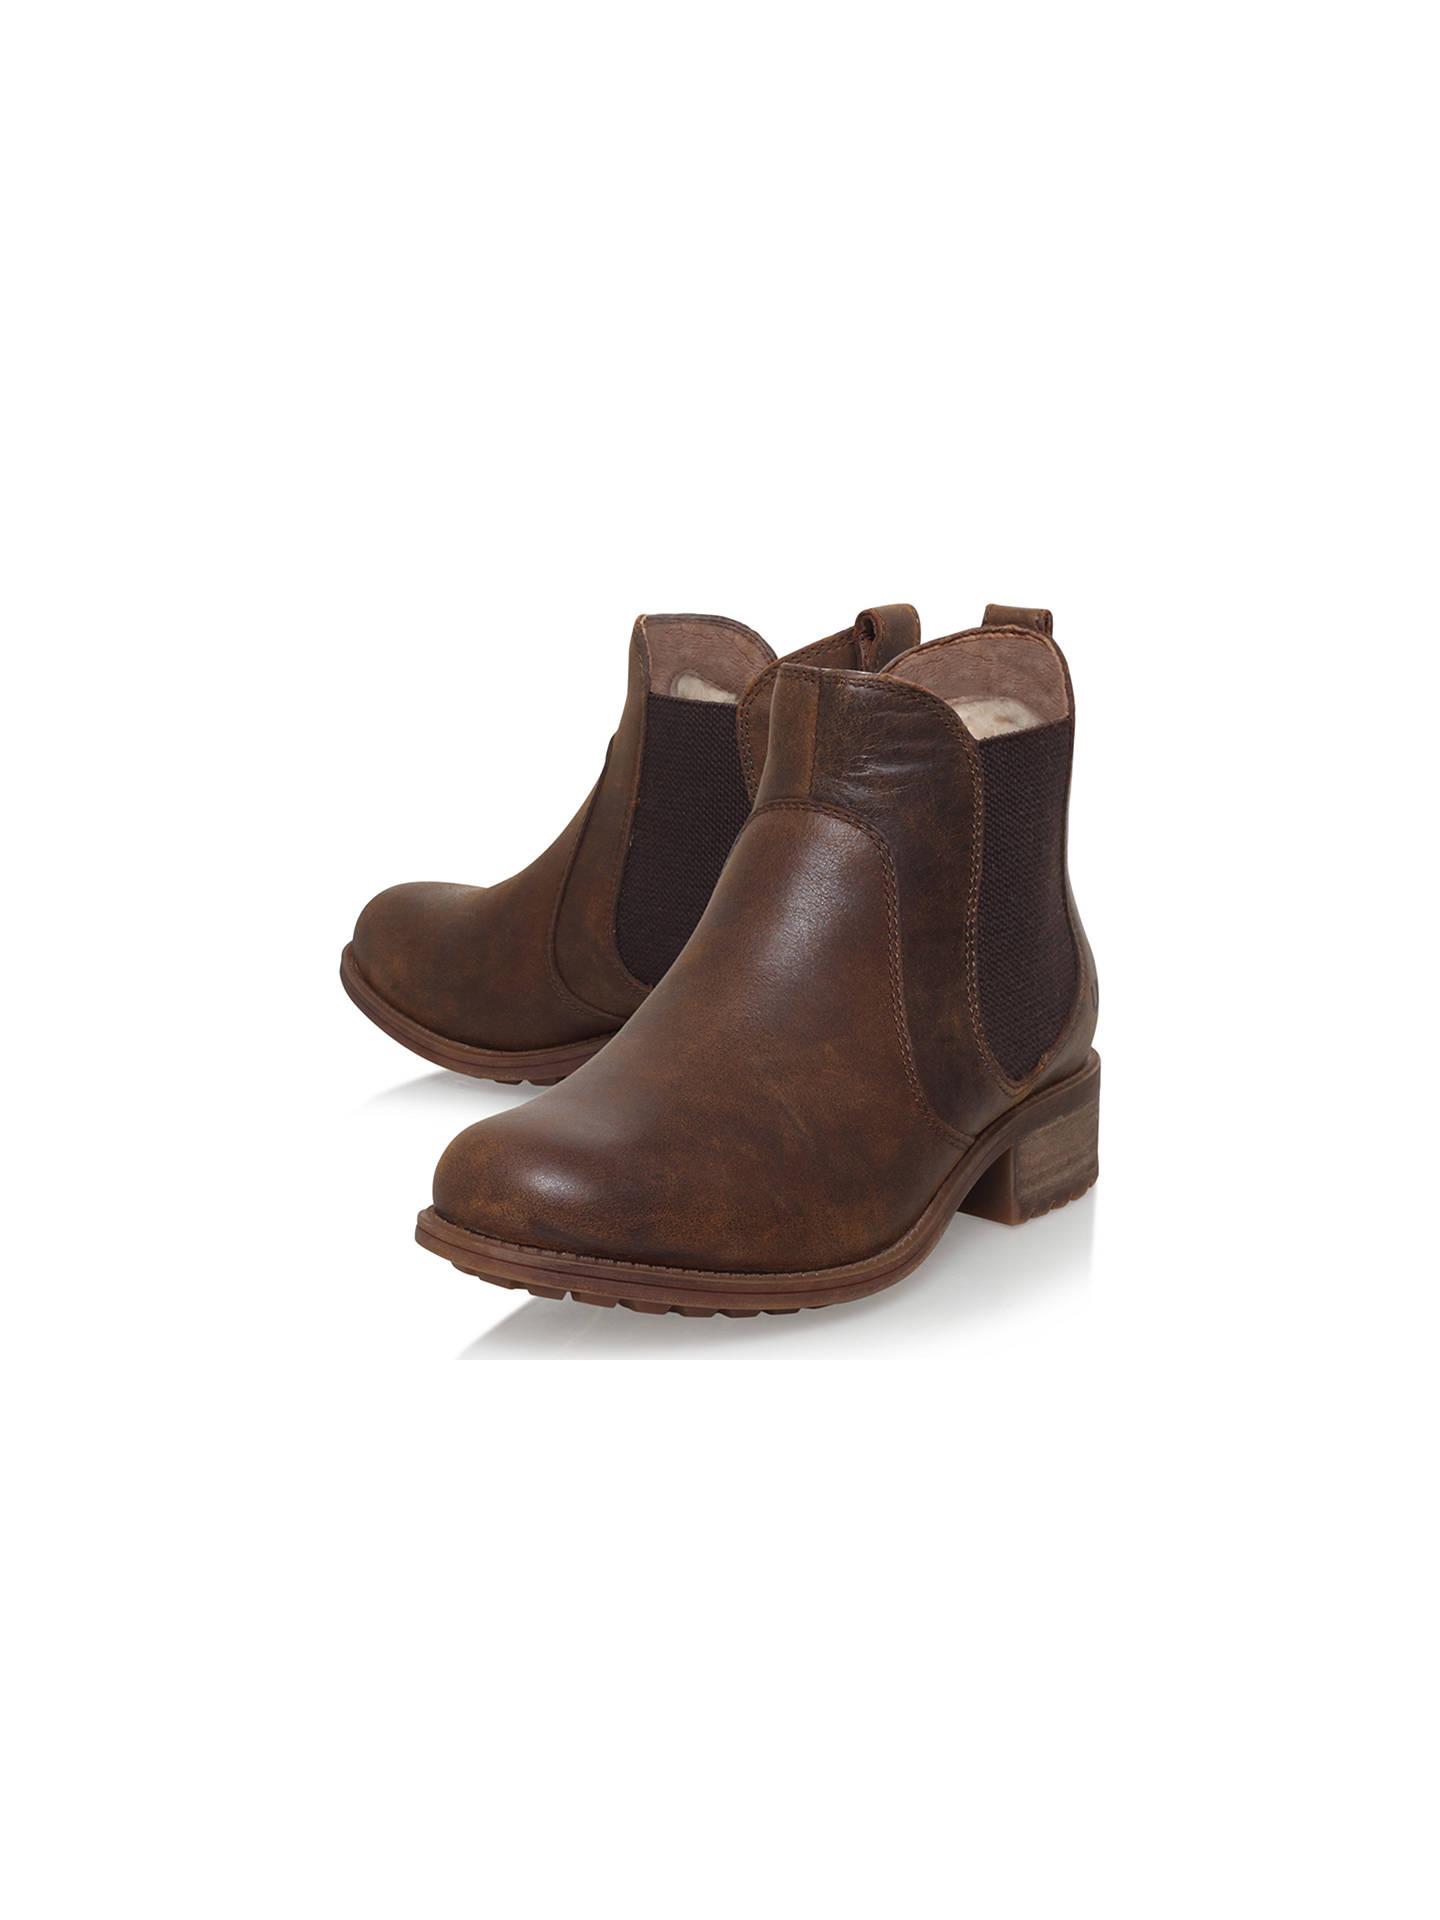 ca81b2a35fd UGG Bonham Block Heeled Ankle Boots, Dark Brown at John Lewis & Partners